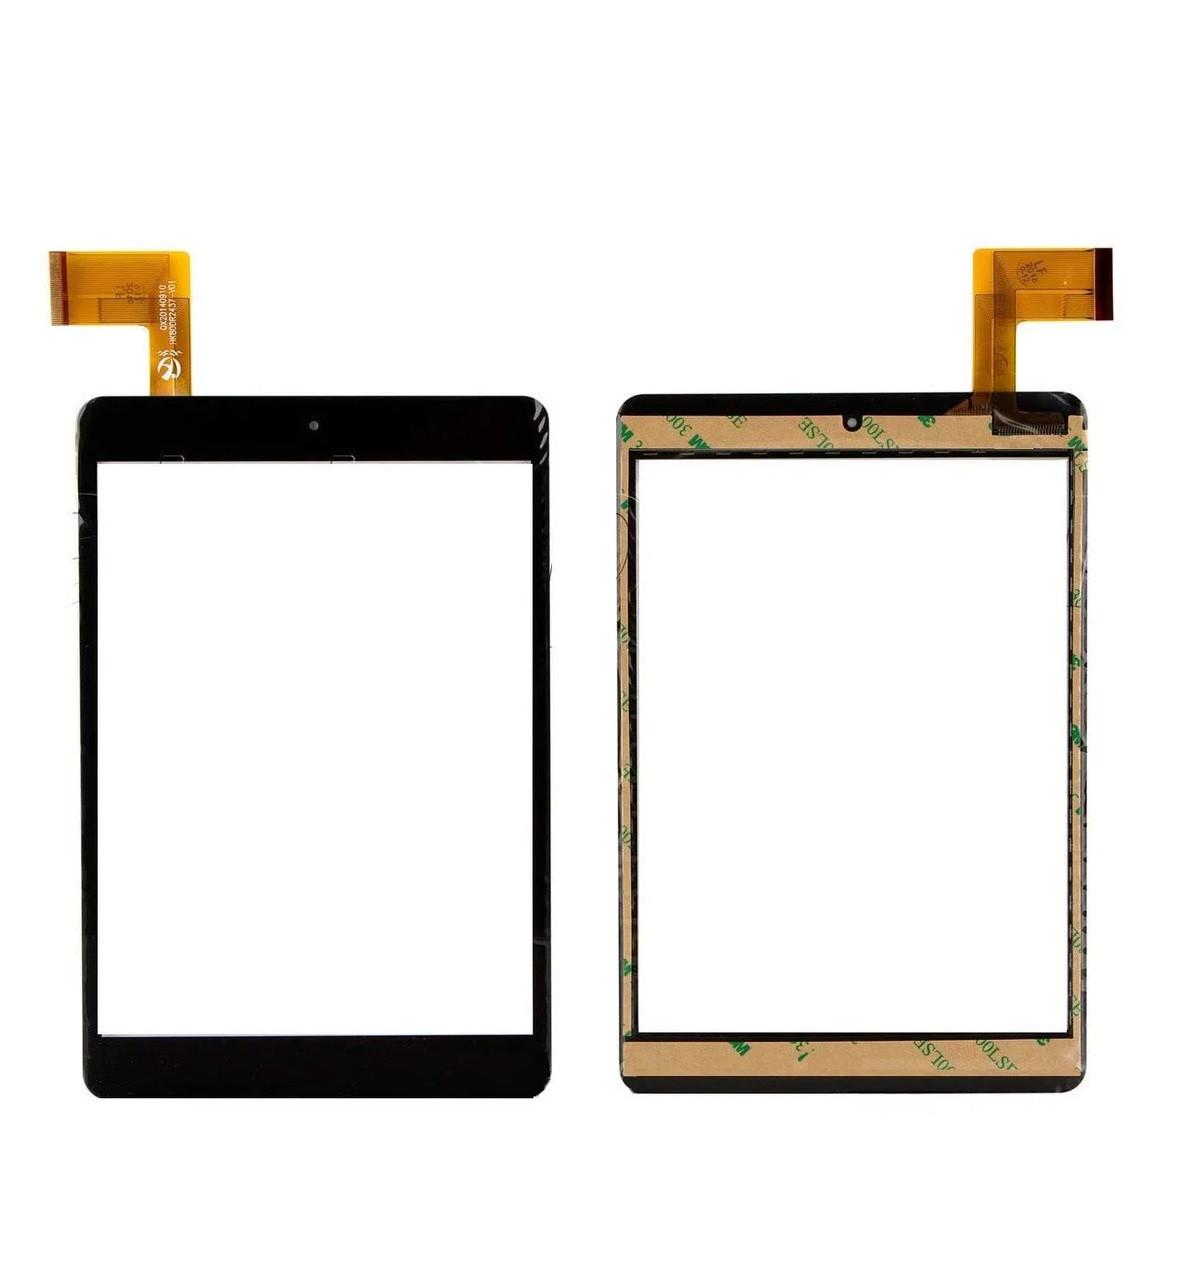 Сенсор для планшета Nomi A07850 (131*197), (HK80DR2437-V01) тип 2 (Чорний) Оригінал Китай